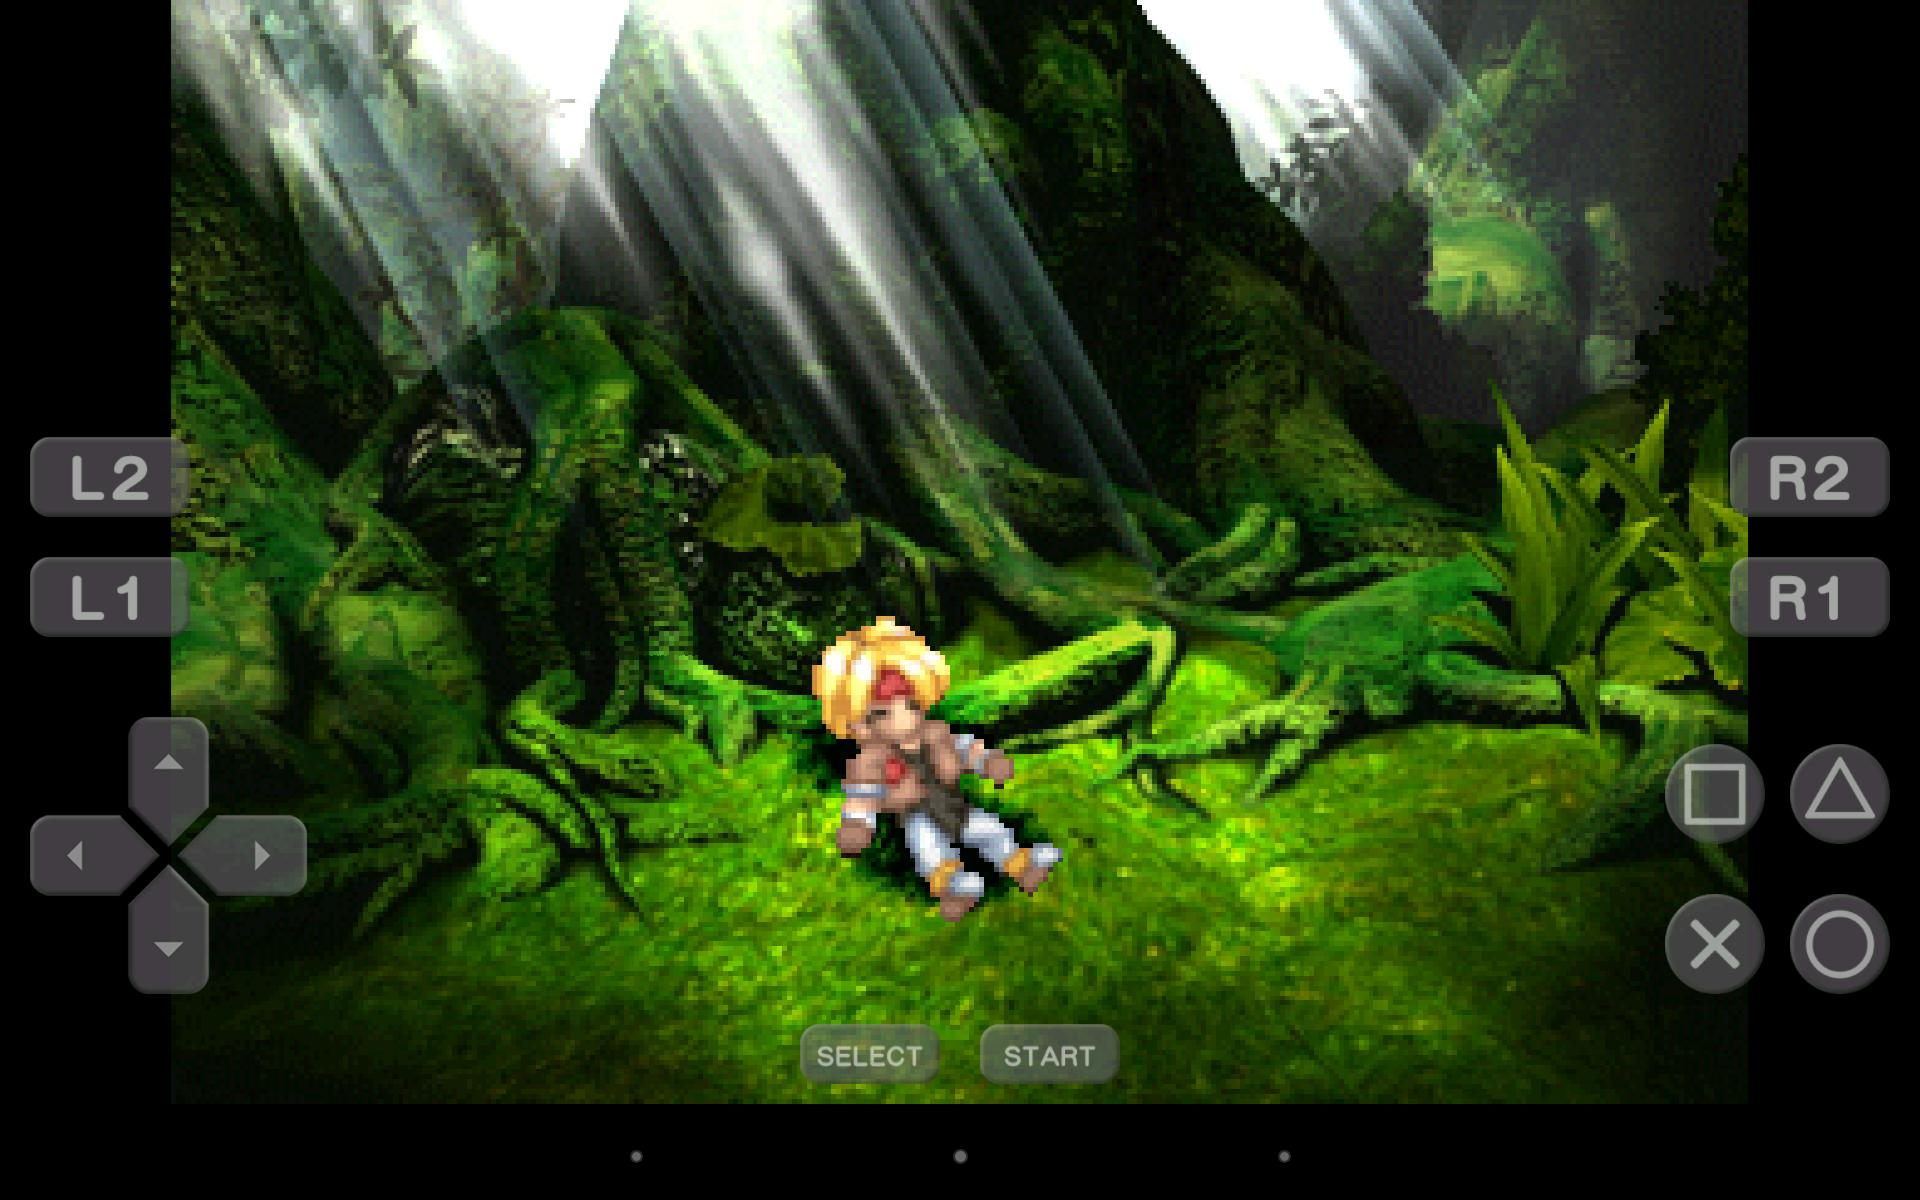 Matsu PSX Emulator - Free for Android - APK Download